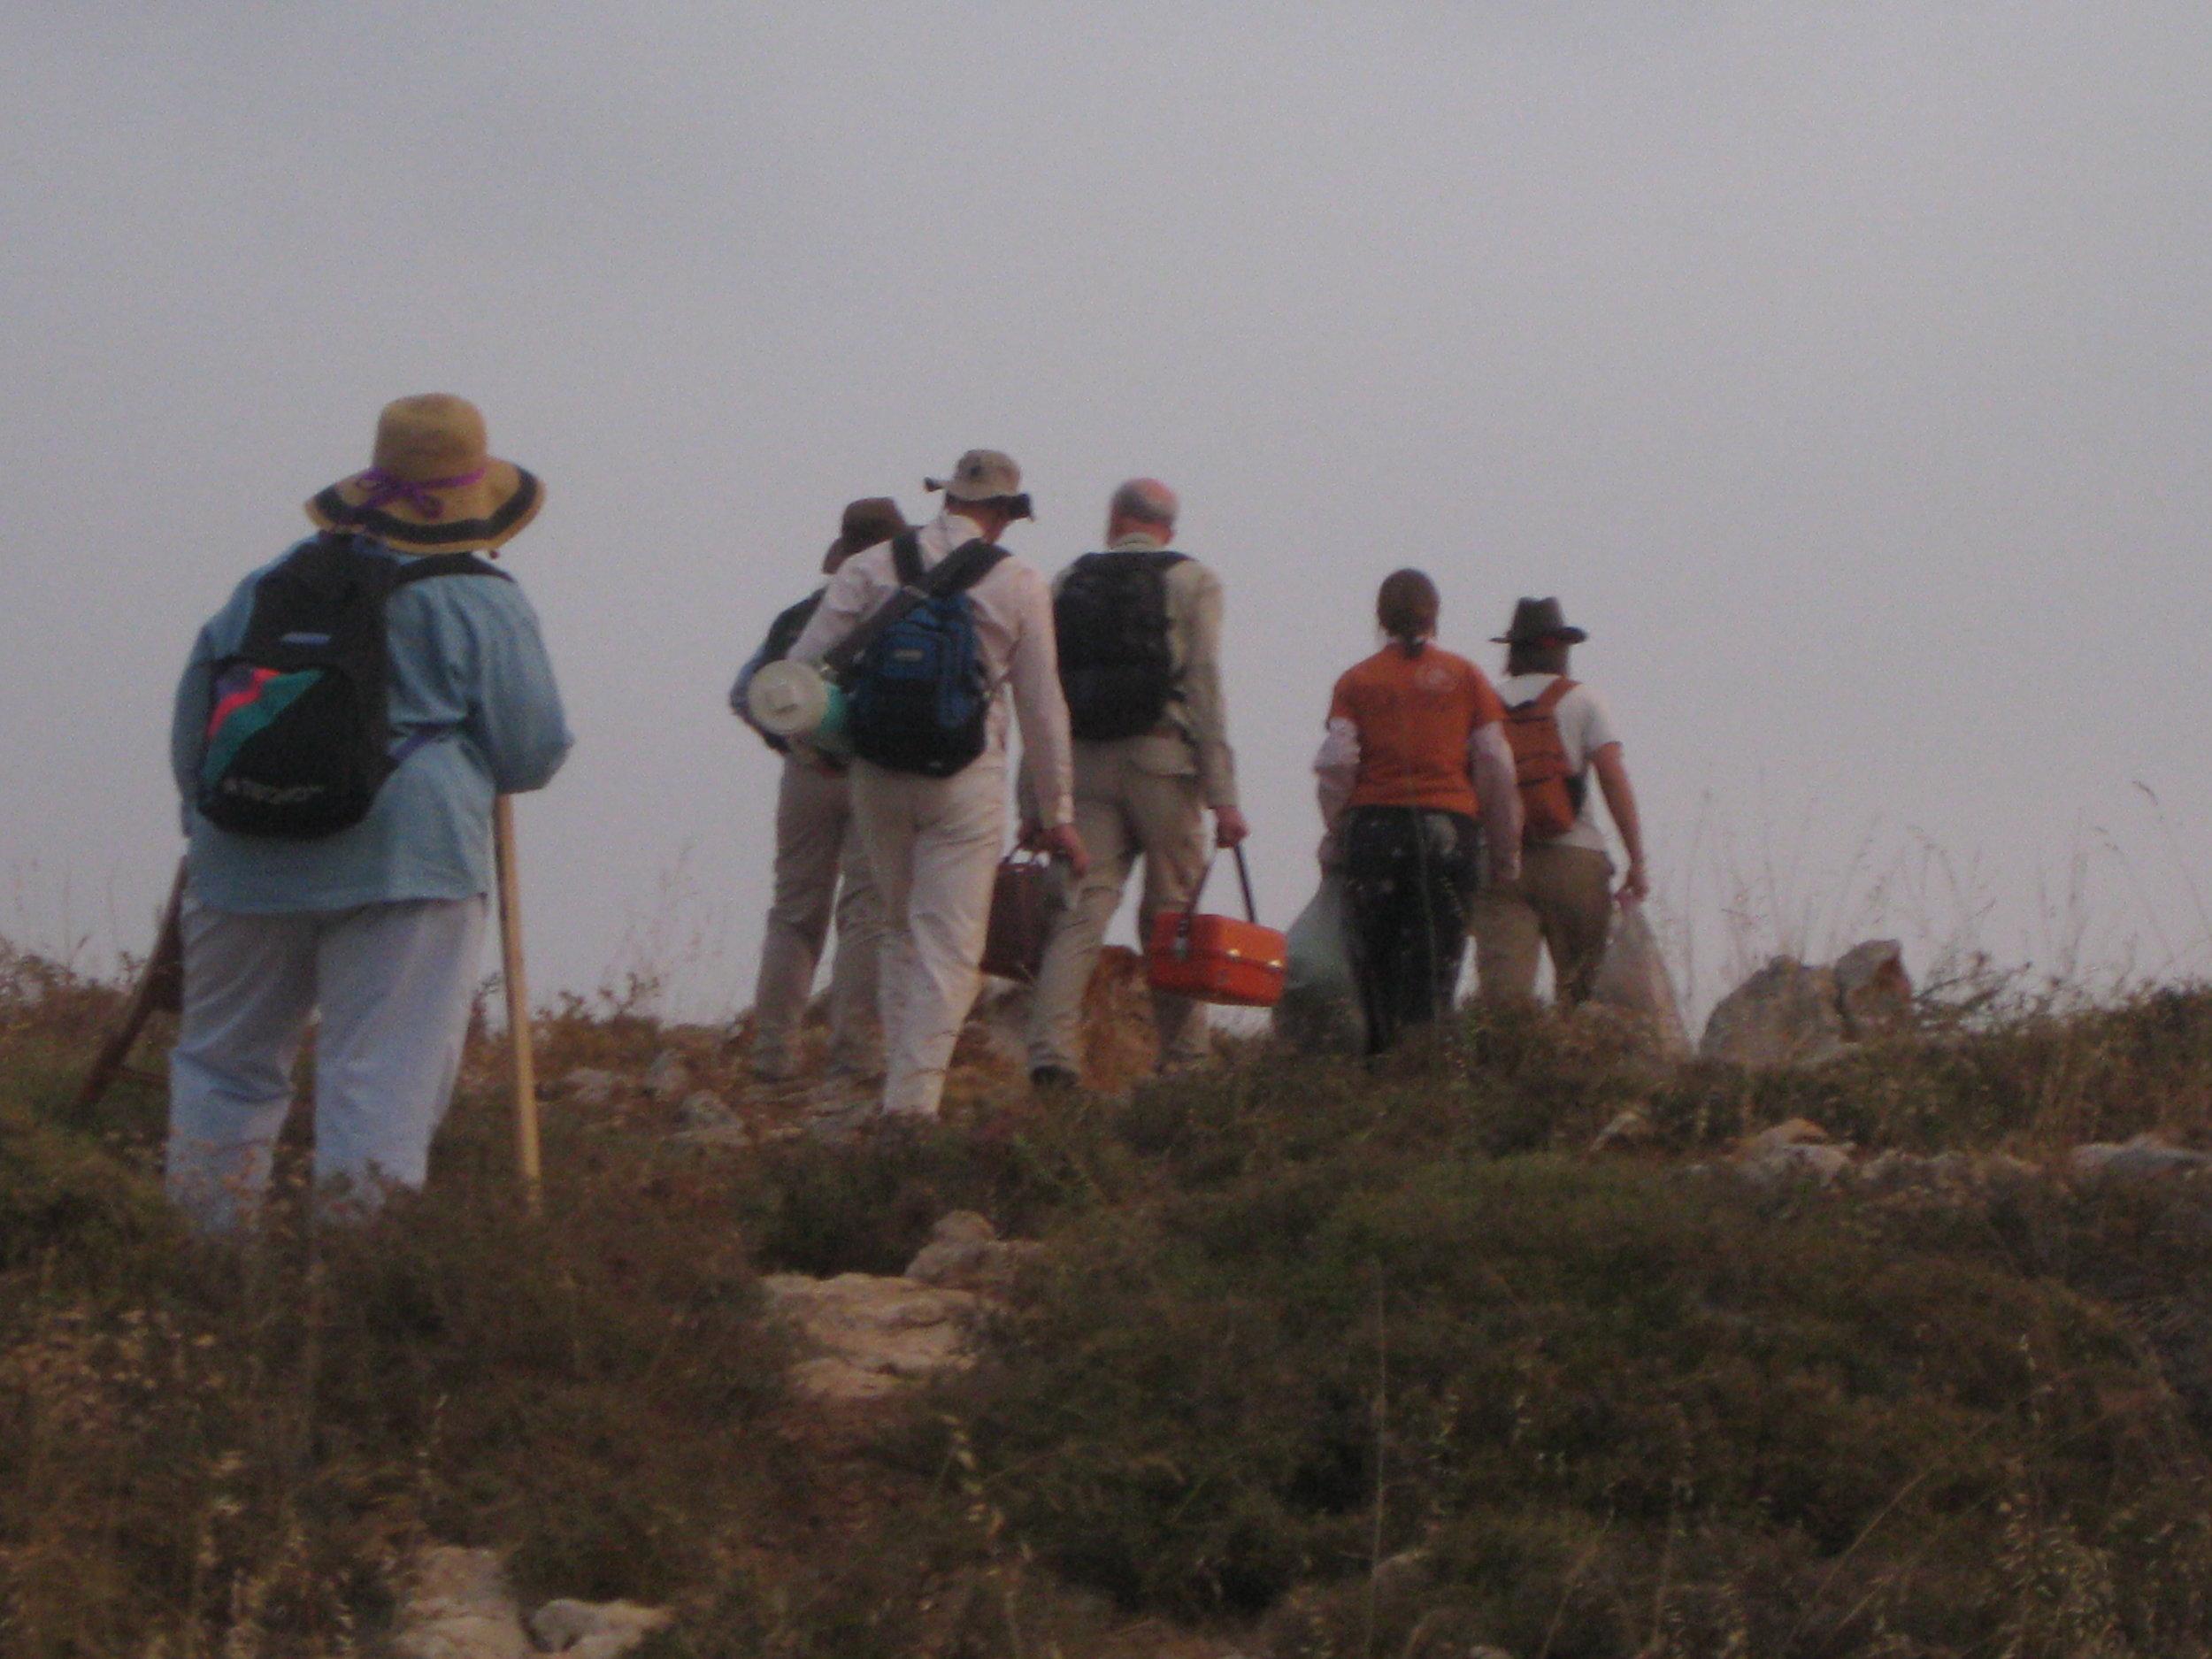 Dig site of Khirbet el-Maqatir, Palestinian West Bank—just over the hill. (2010)